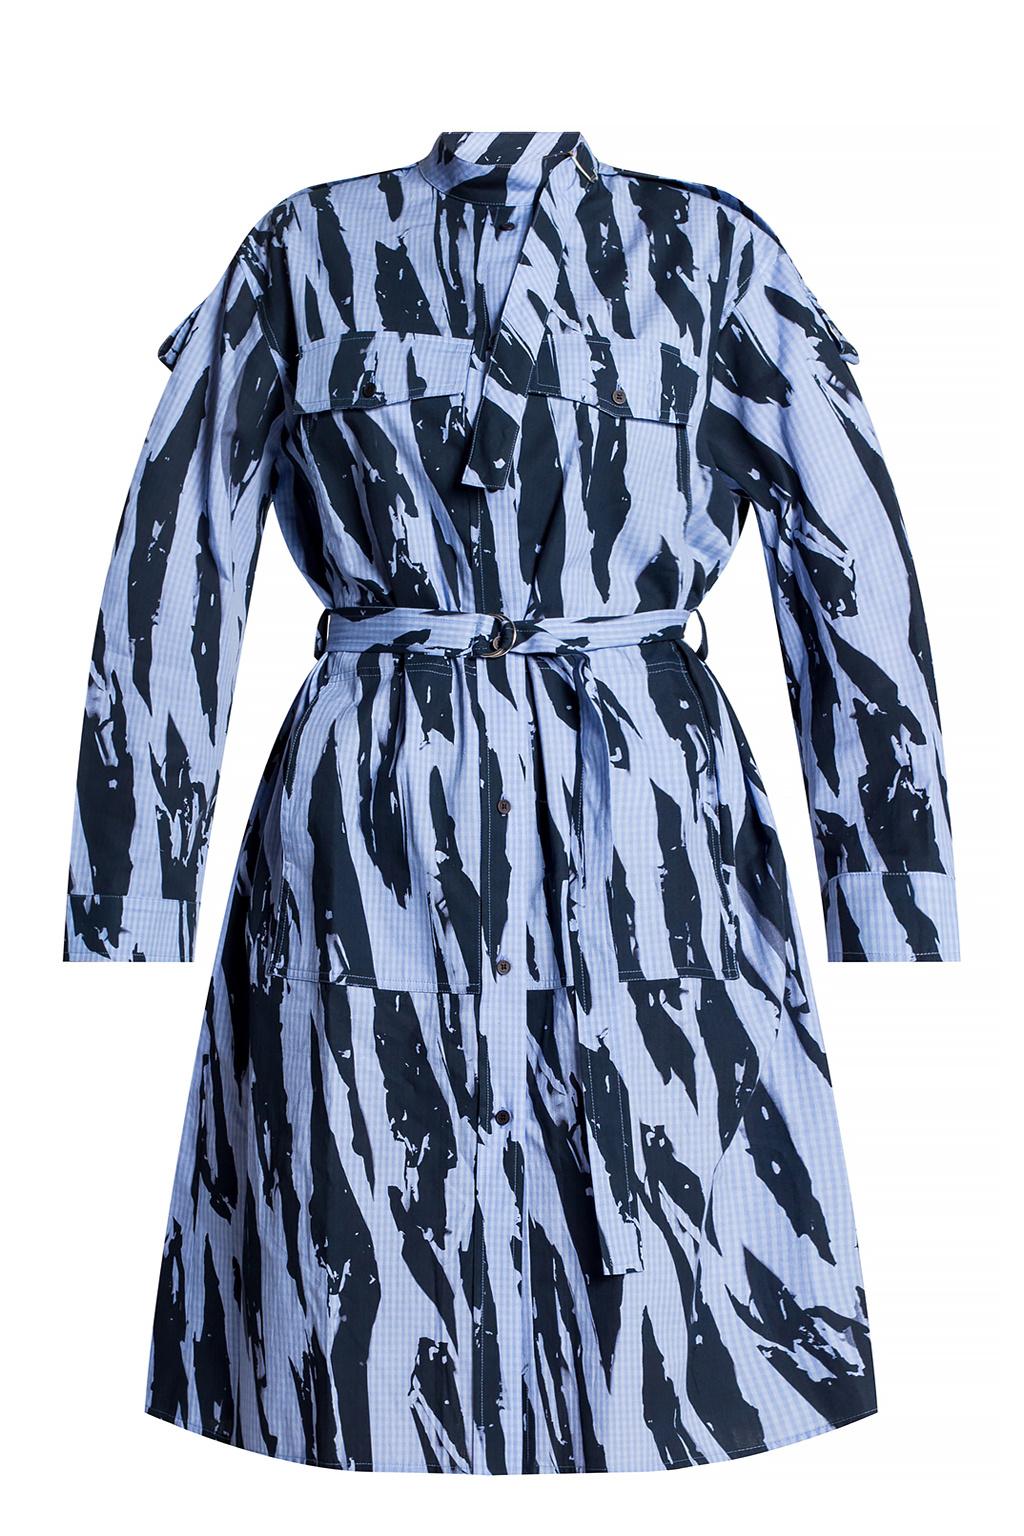 Kenzo 图案连衣裙